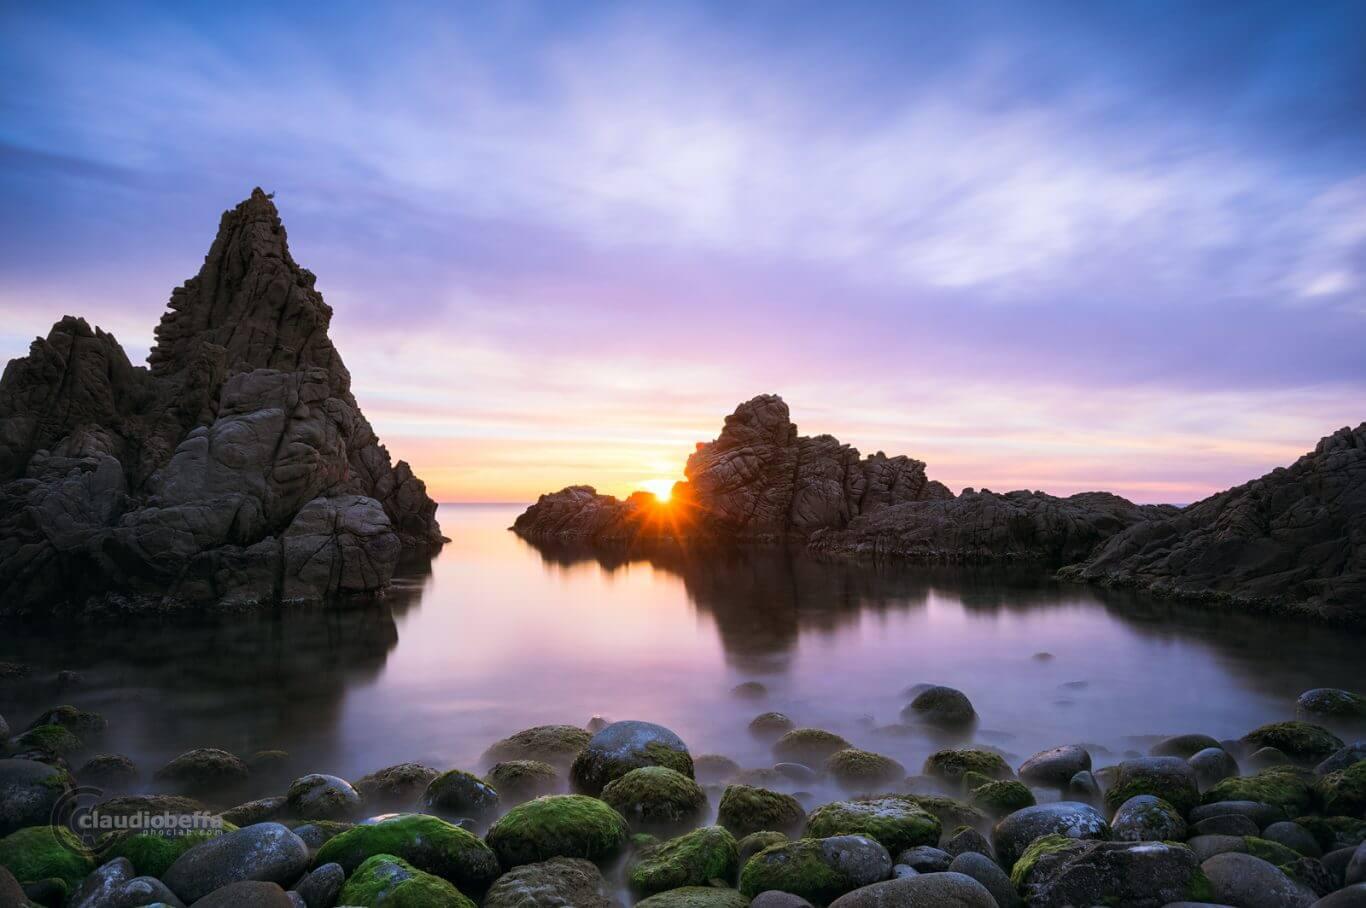 Capo Pecora, Sardinia, Italy, Sea, Seascape, Sunset, Sun, Sunbeams, Cove, Shore, Pebbles, Rocks, Long exposure, Convergence